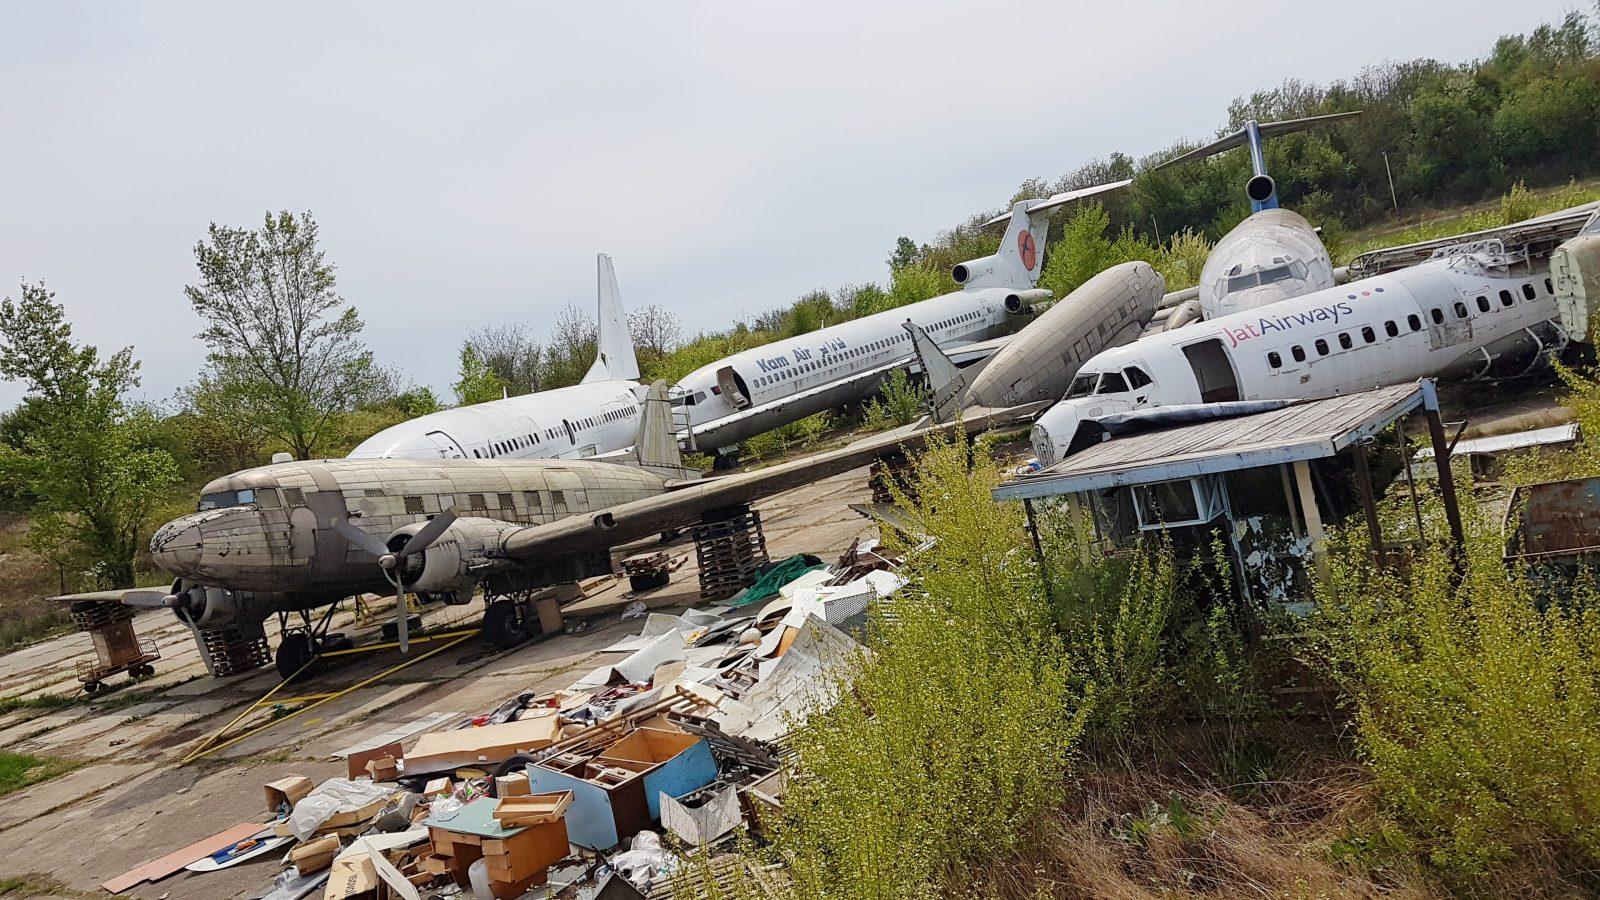 [HITNO] Ako Muzej vazduhoplovstva Beograd ne prikupi 20.000 evra Boing 727 i Konver 440 mogu biti zauvek izgubljeni